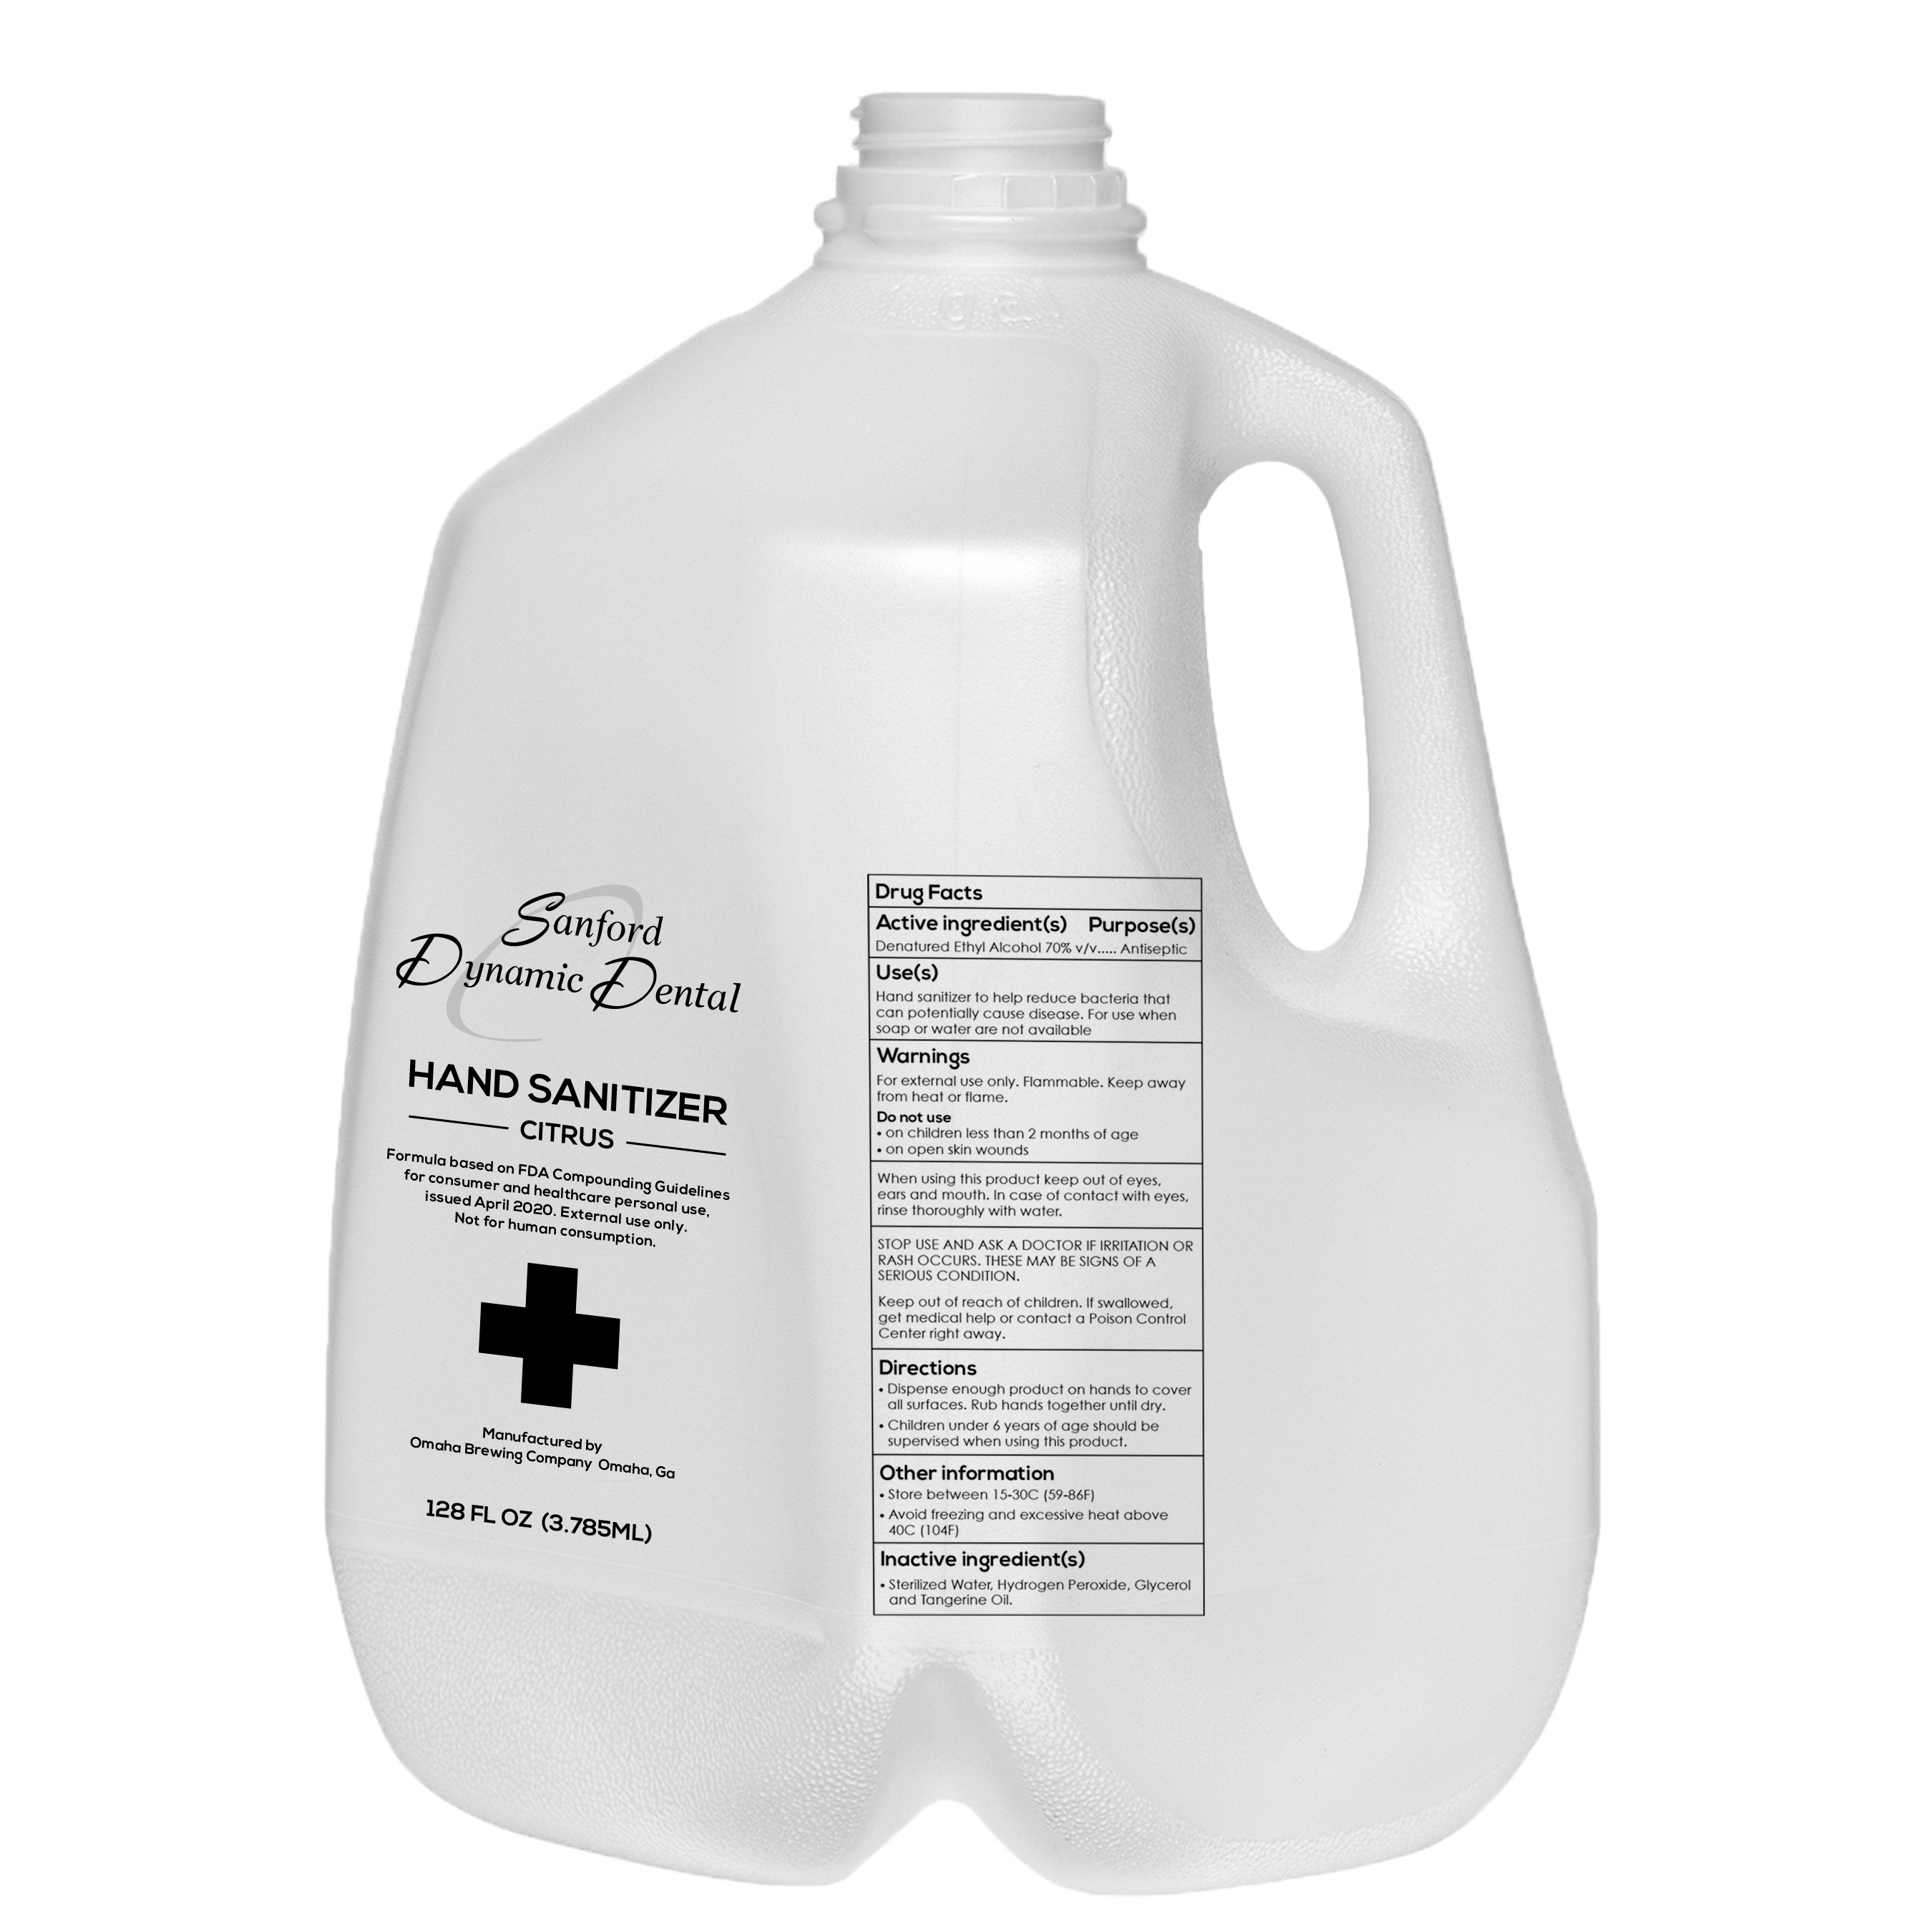 Liquid Hand Sanitizer —- (1 gallon) ($40/gallon) – Sanford DMD